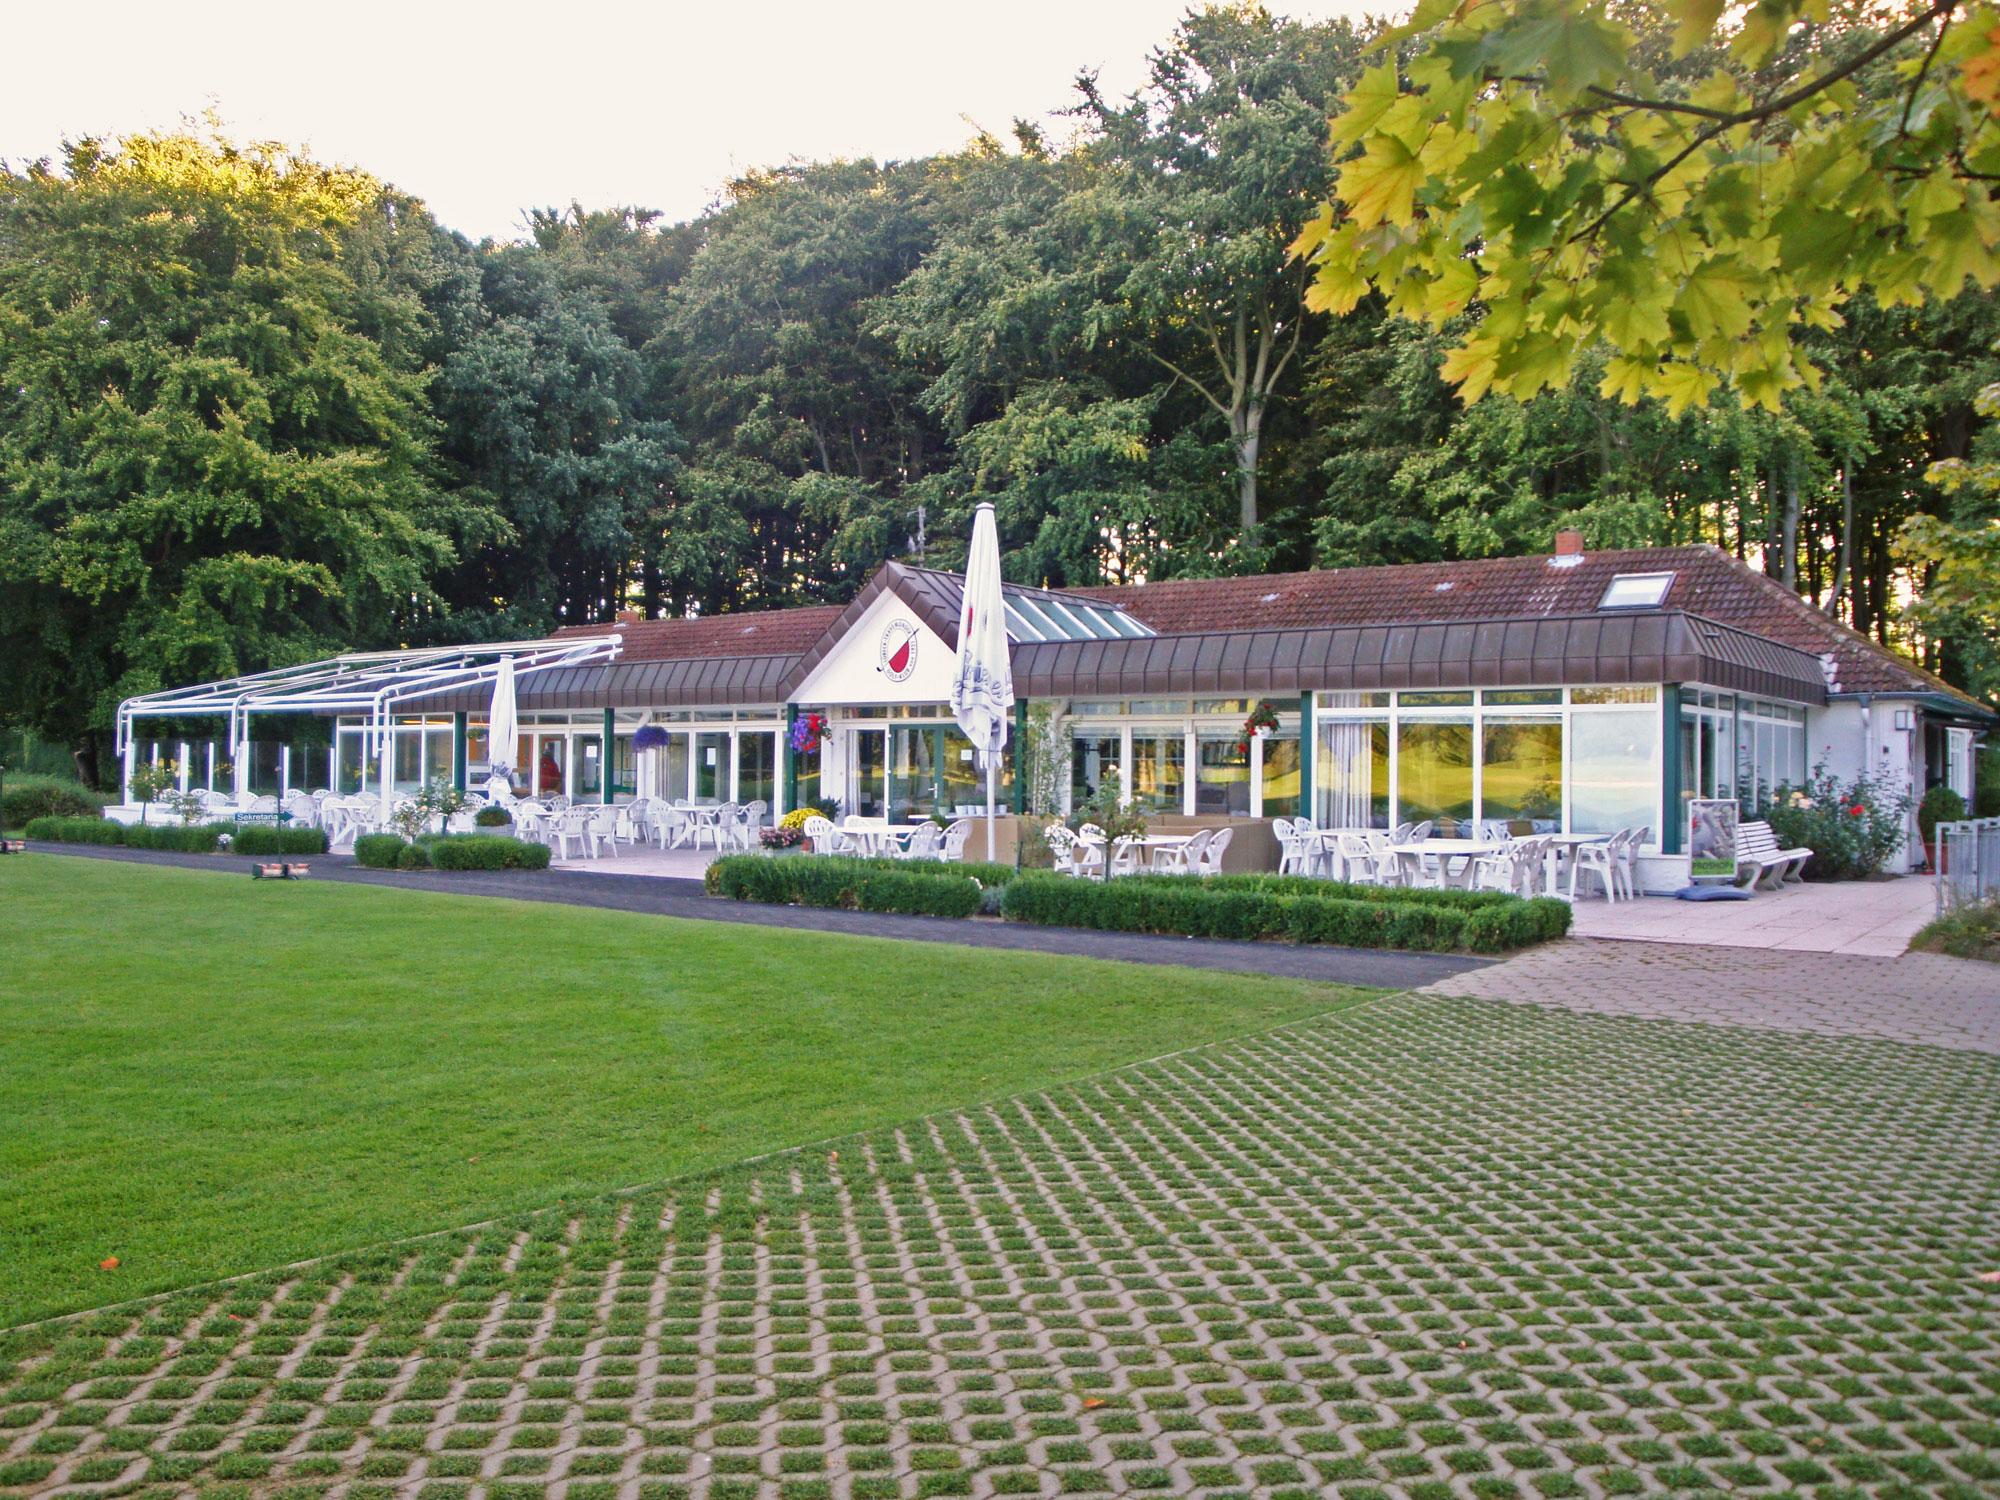 Kowitzberg 41 - Klubhaus des Lübeck-Travemünder Golf-Klubs (LTGK)